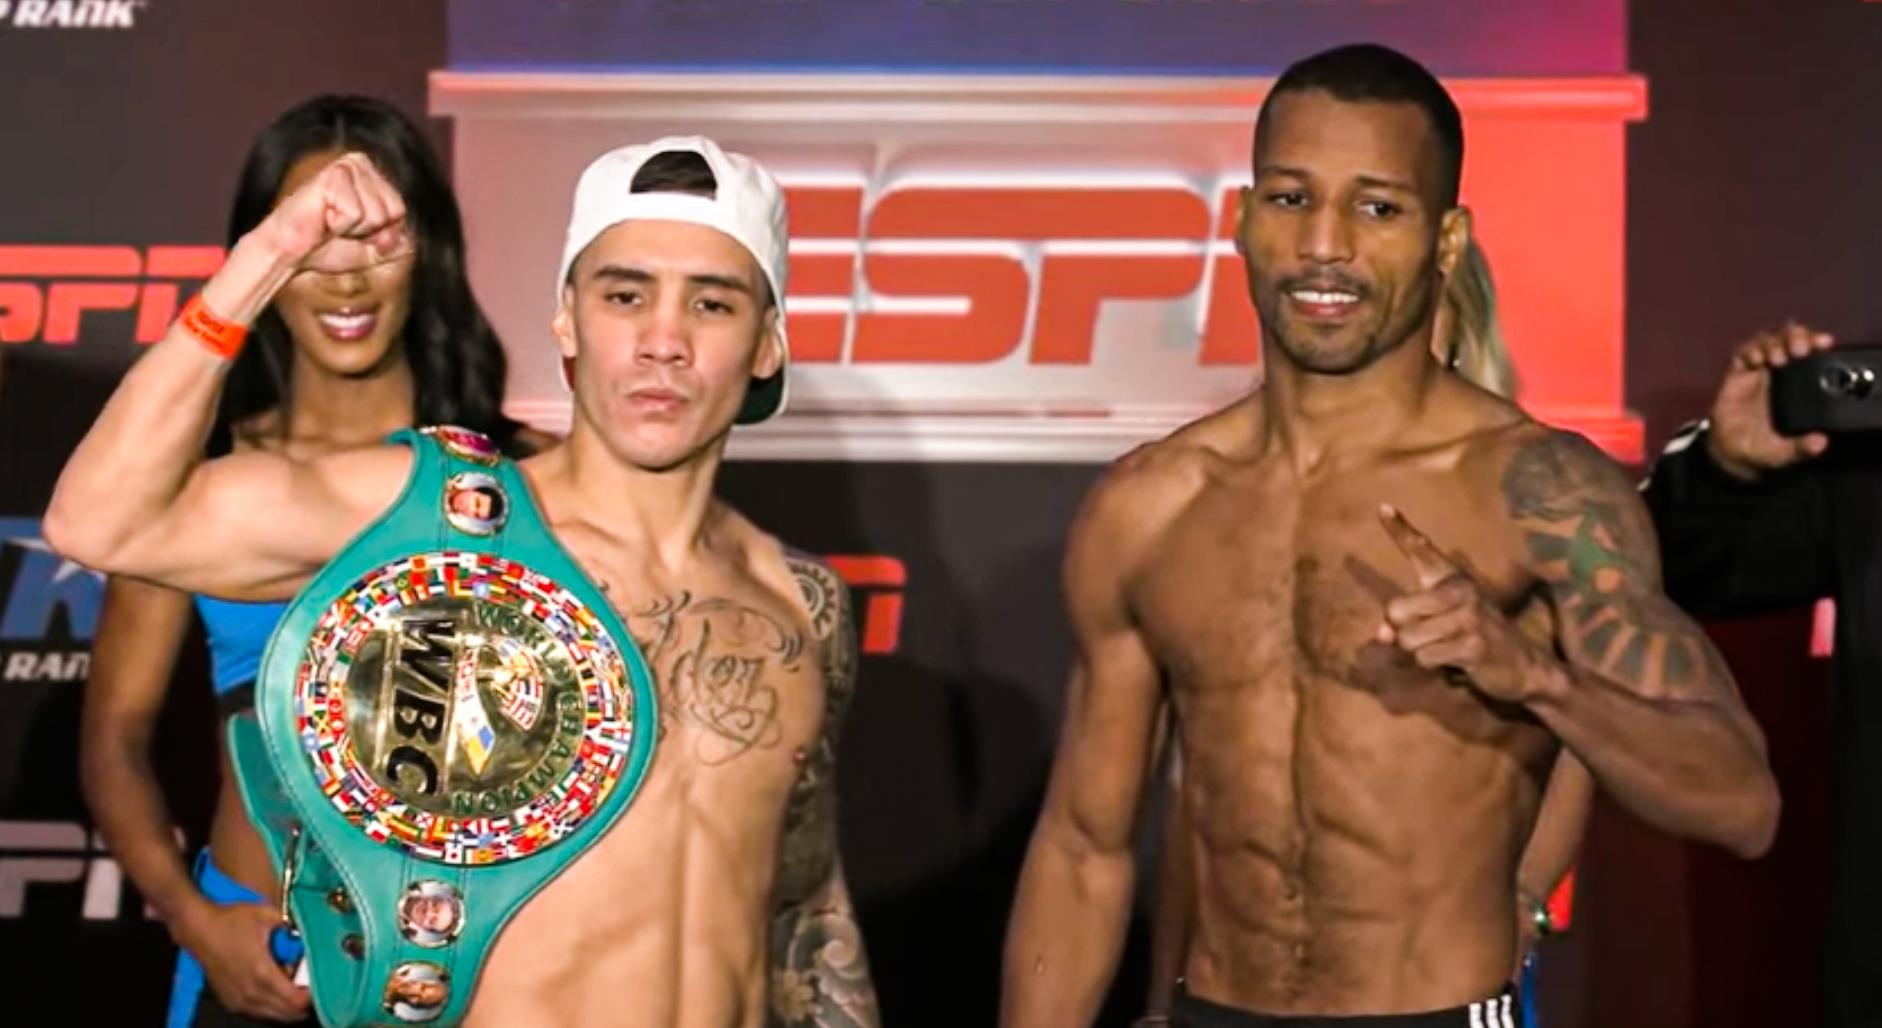 Oscar Valdez & Robson Conceição weigh-in ahead of Friday night | Boxen247.com (Kristian von Sponneck)